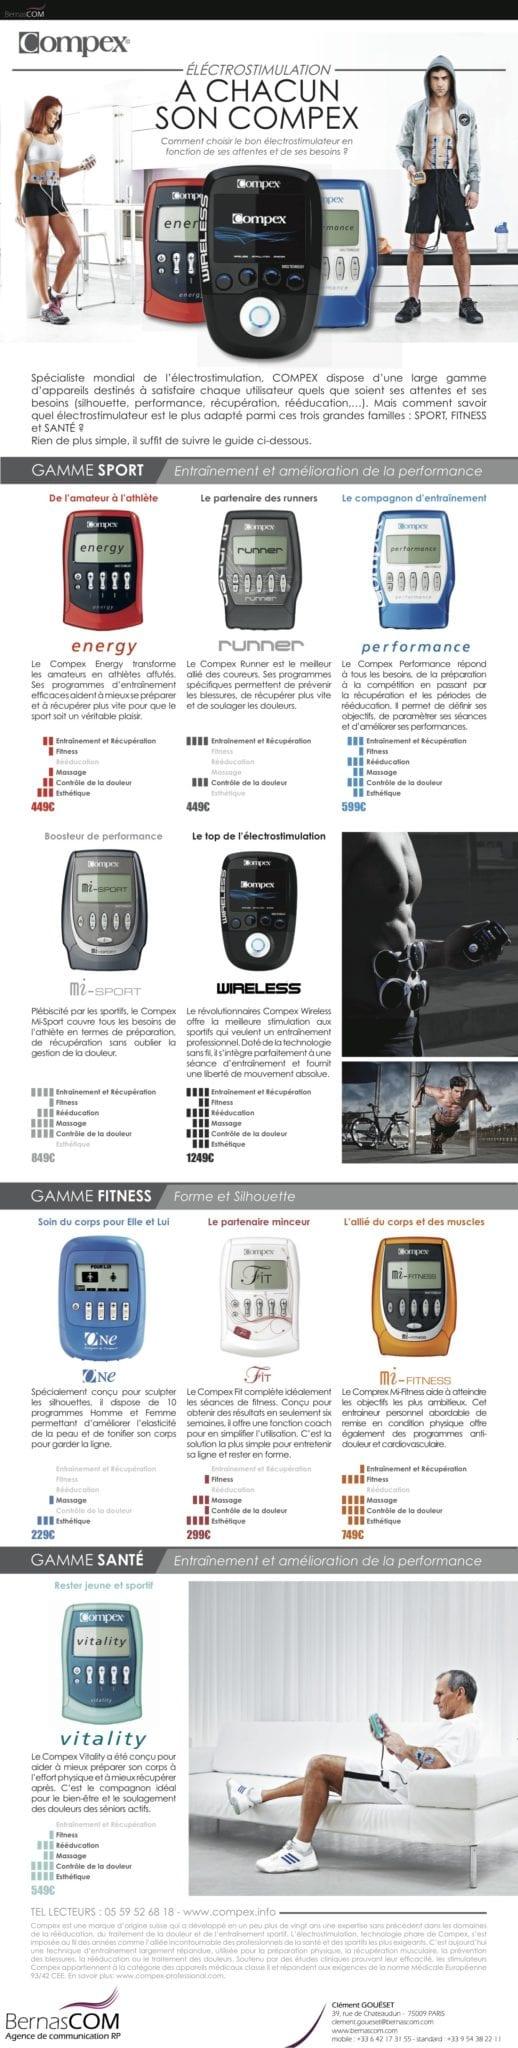 COMPEX-AchacunSonCompex-Avr13